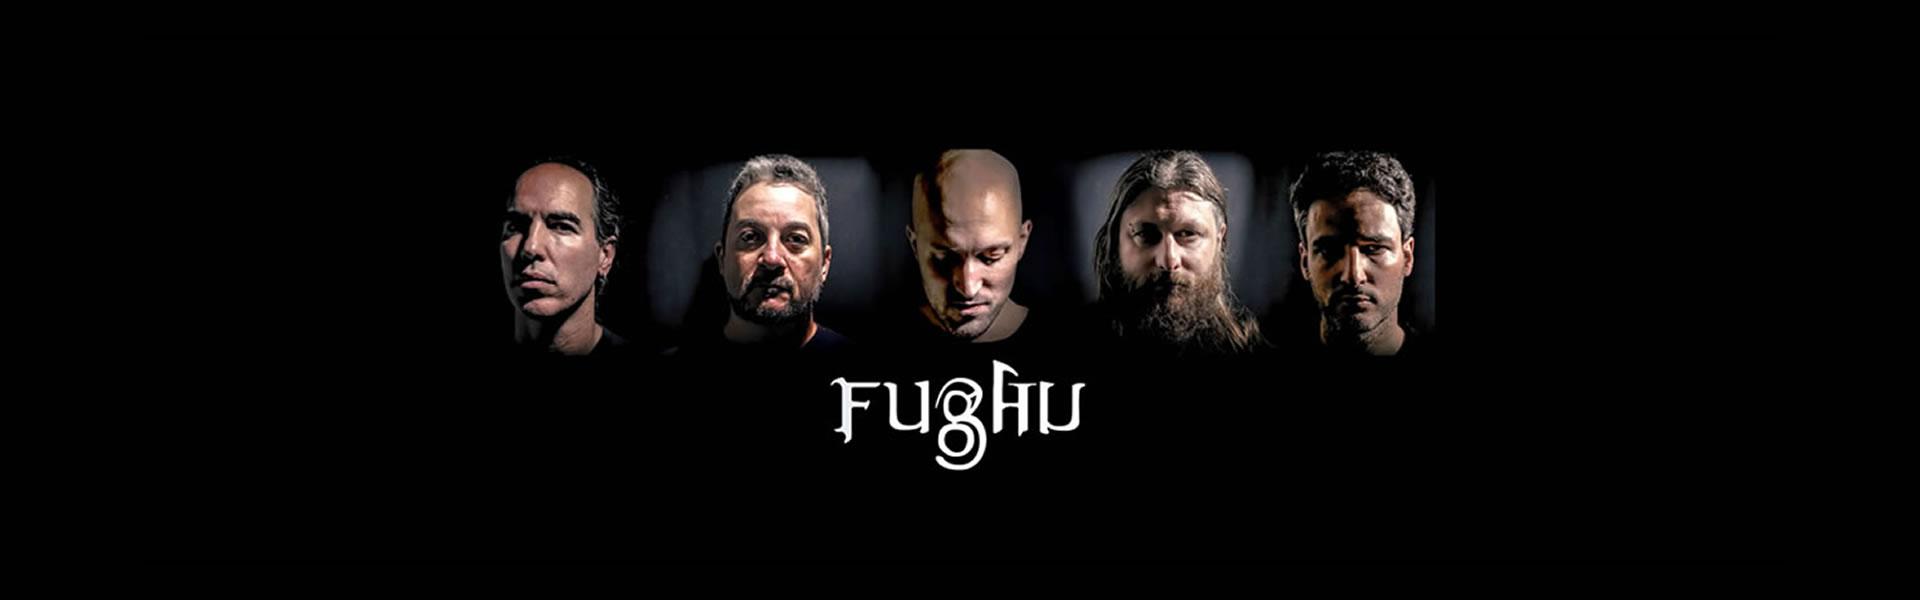 https://www.fughu.com/wp-content/uploads/2017/07/cab-fughu-2017-renzo.jpg